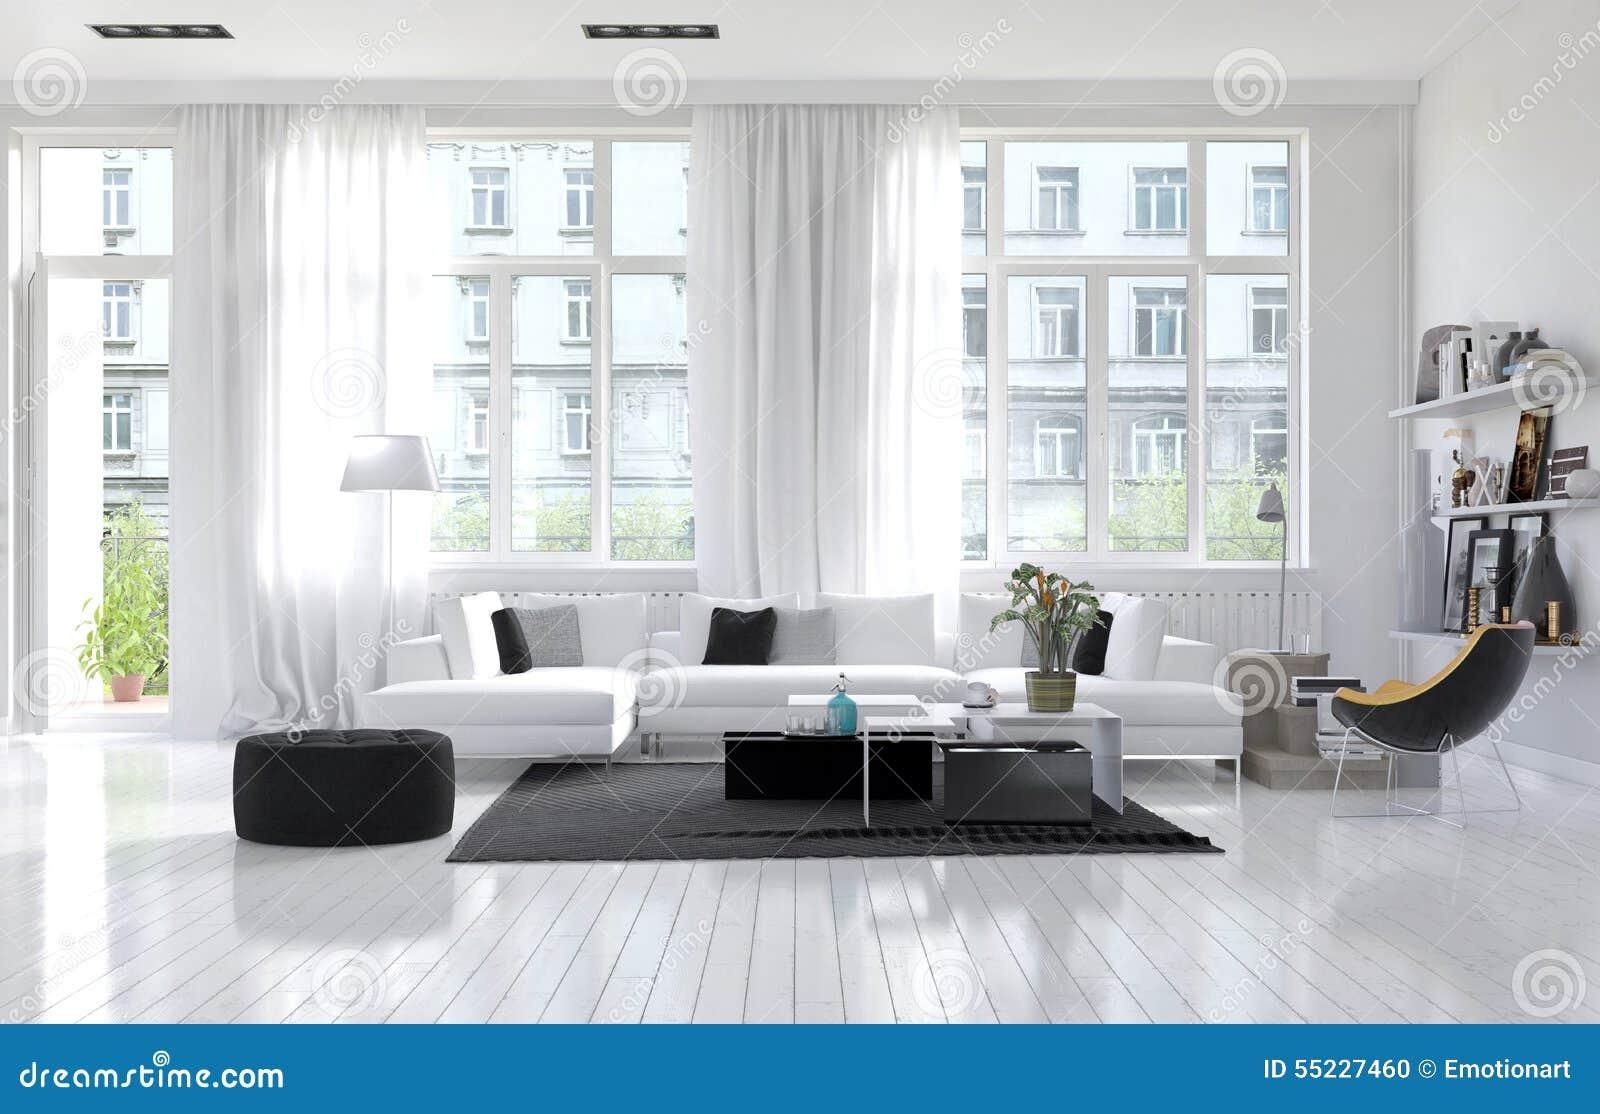 Grosses Geraumiges Modernes Weisses Wohnzimmer Stock Abbildung